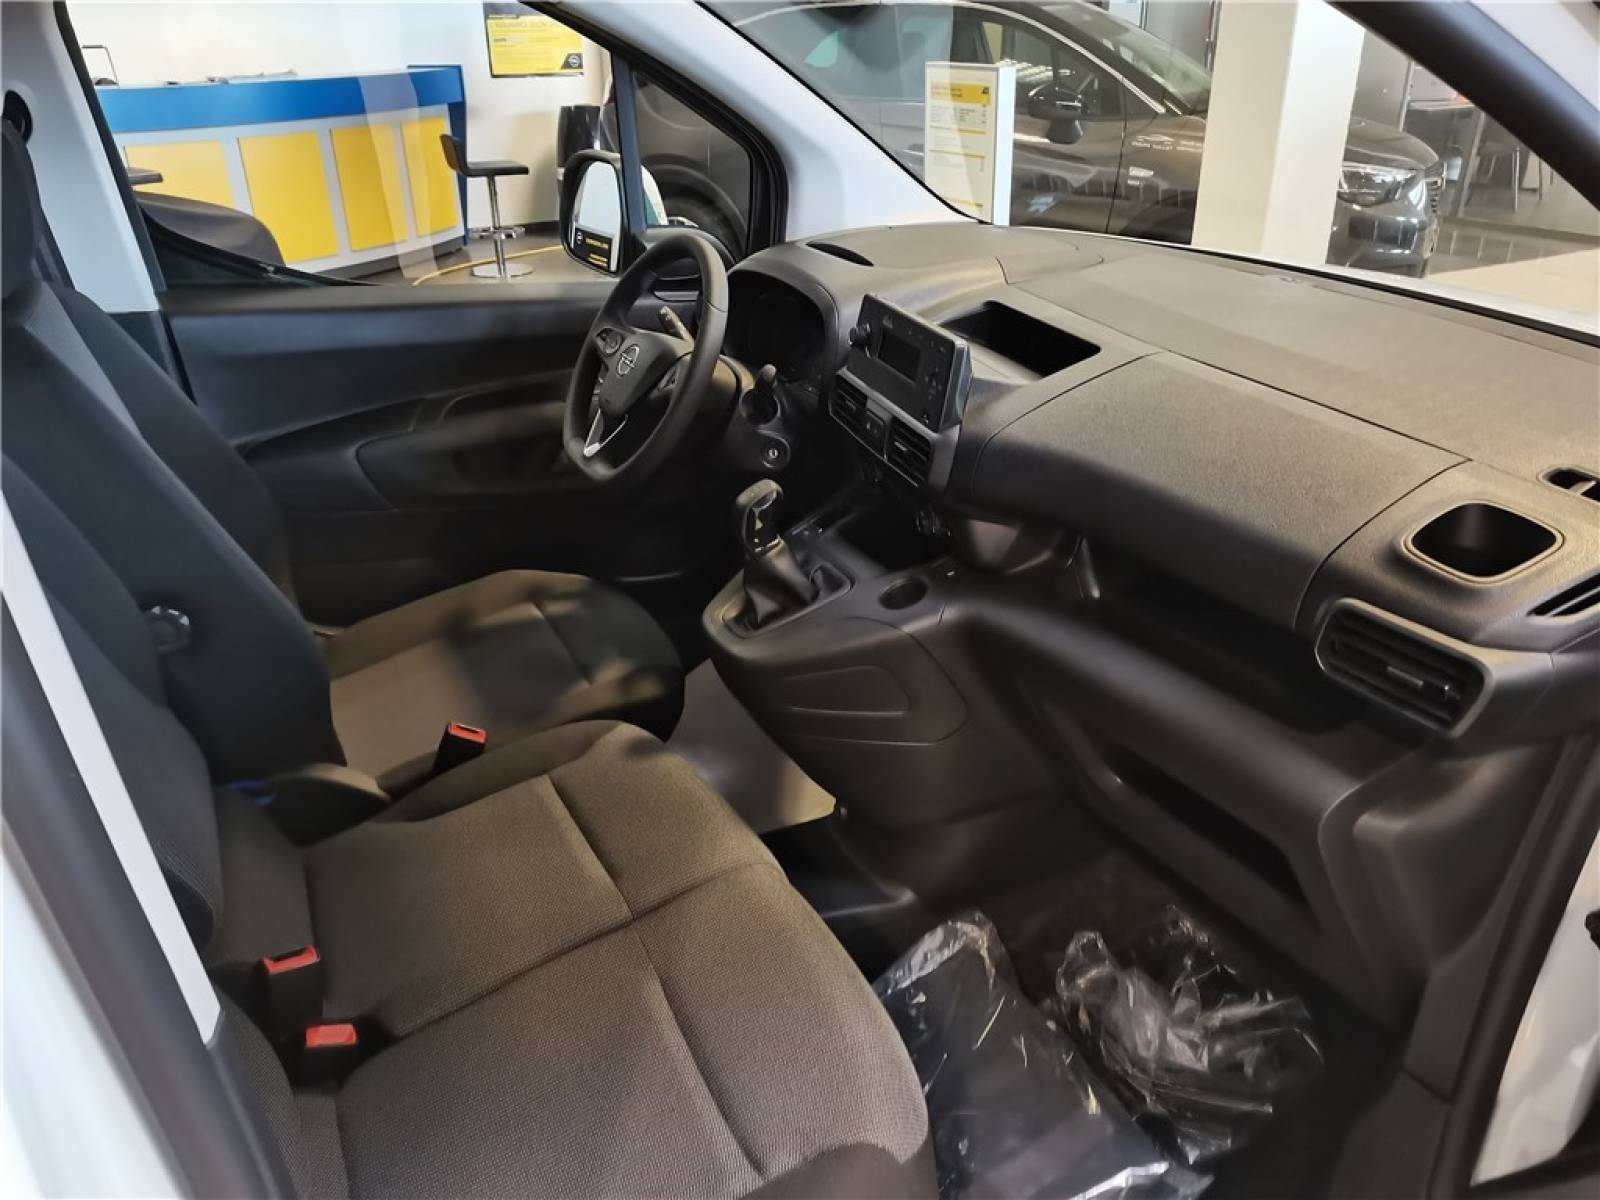 OPEL COMBO CARGO 1.5 100 CH L1H1 STANDARD - véhicule d'occasion - Groupe Guillet - Opel Magicauto - Chalon-sur-Saône - 71380 - Saint-Marcel - 25